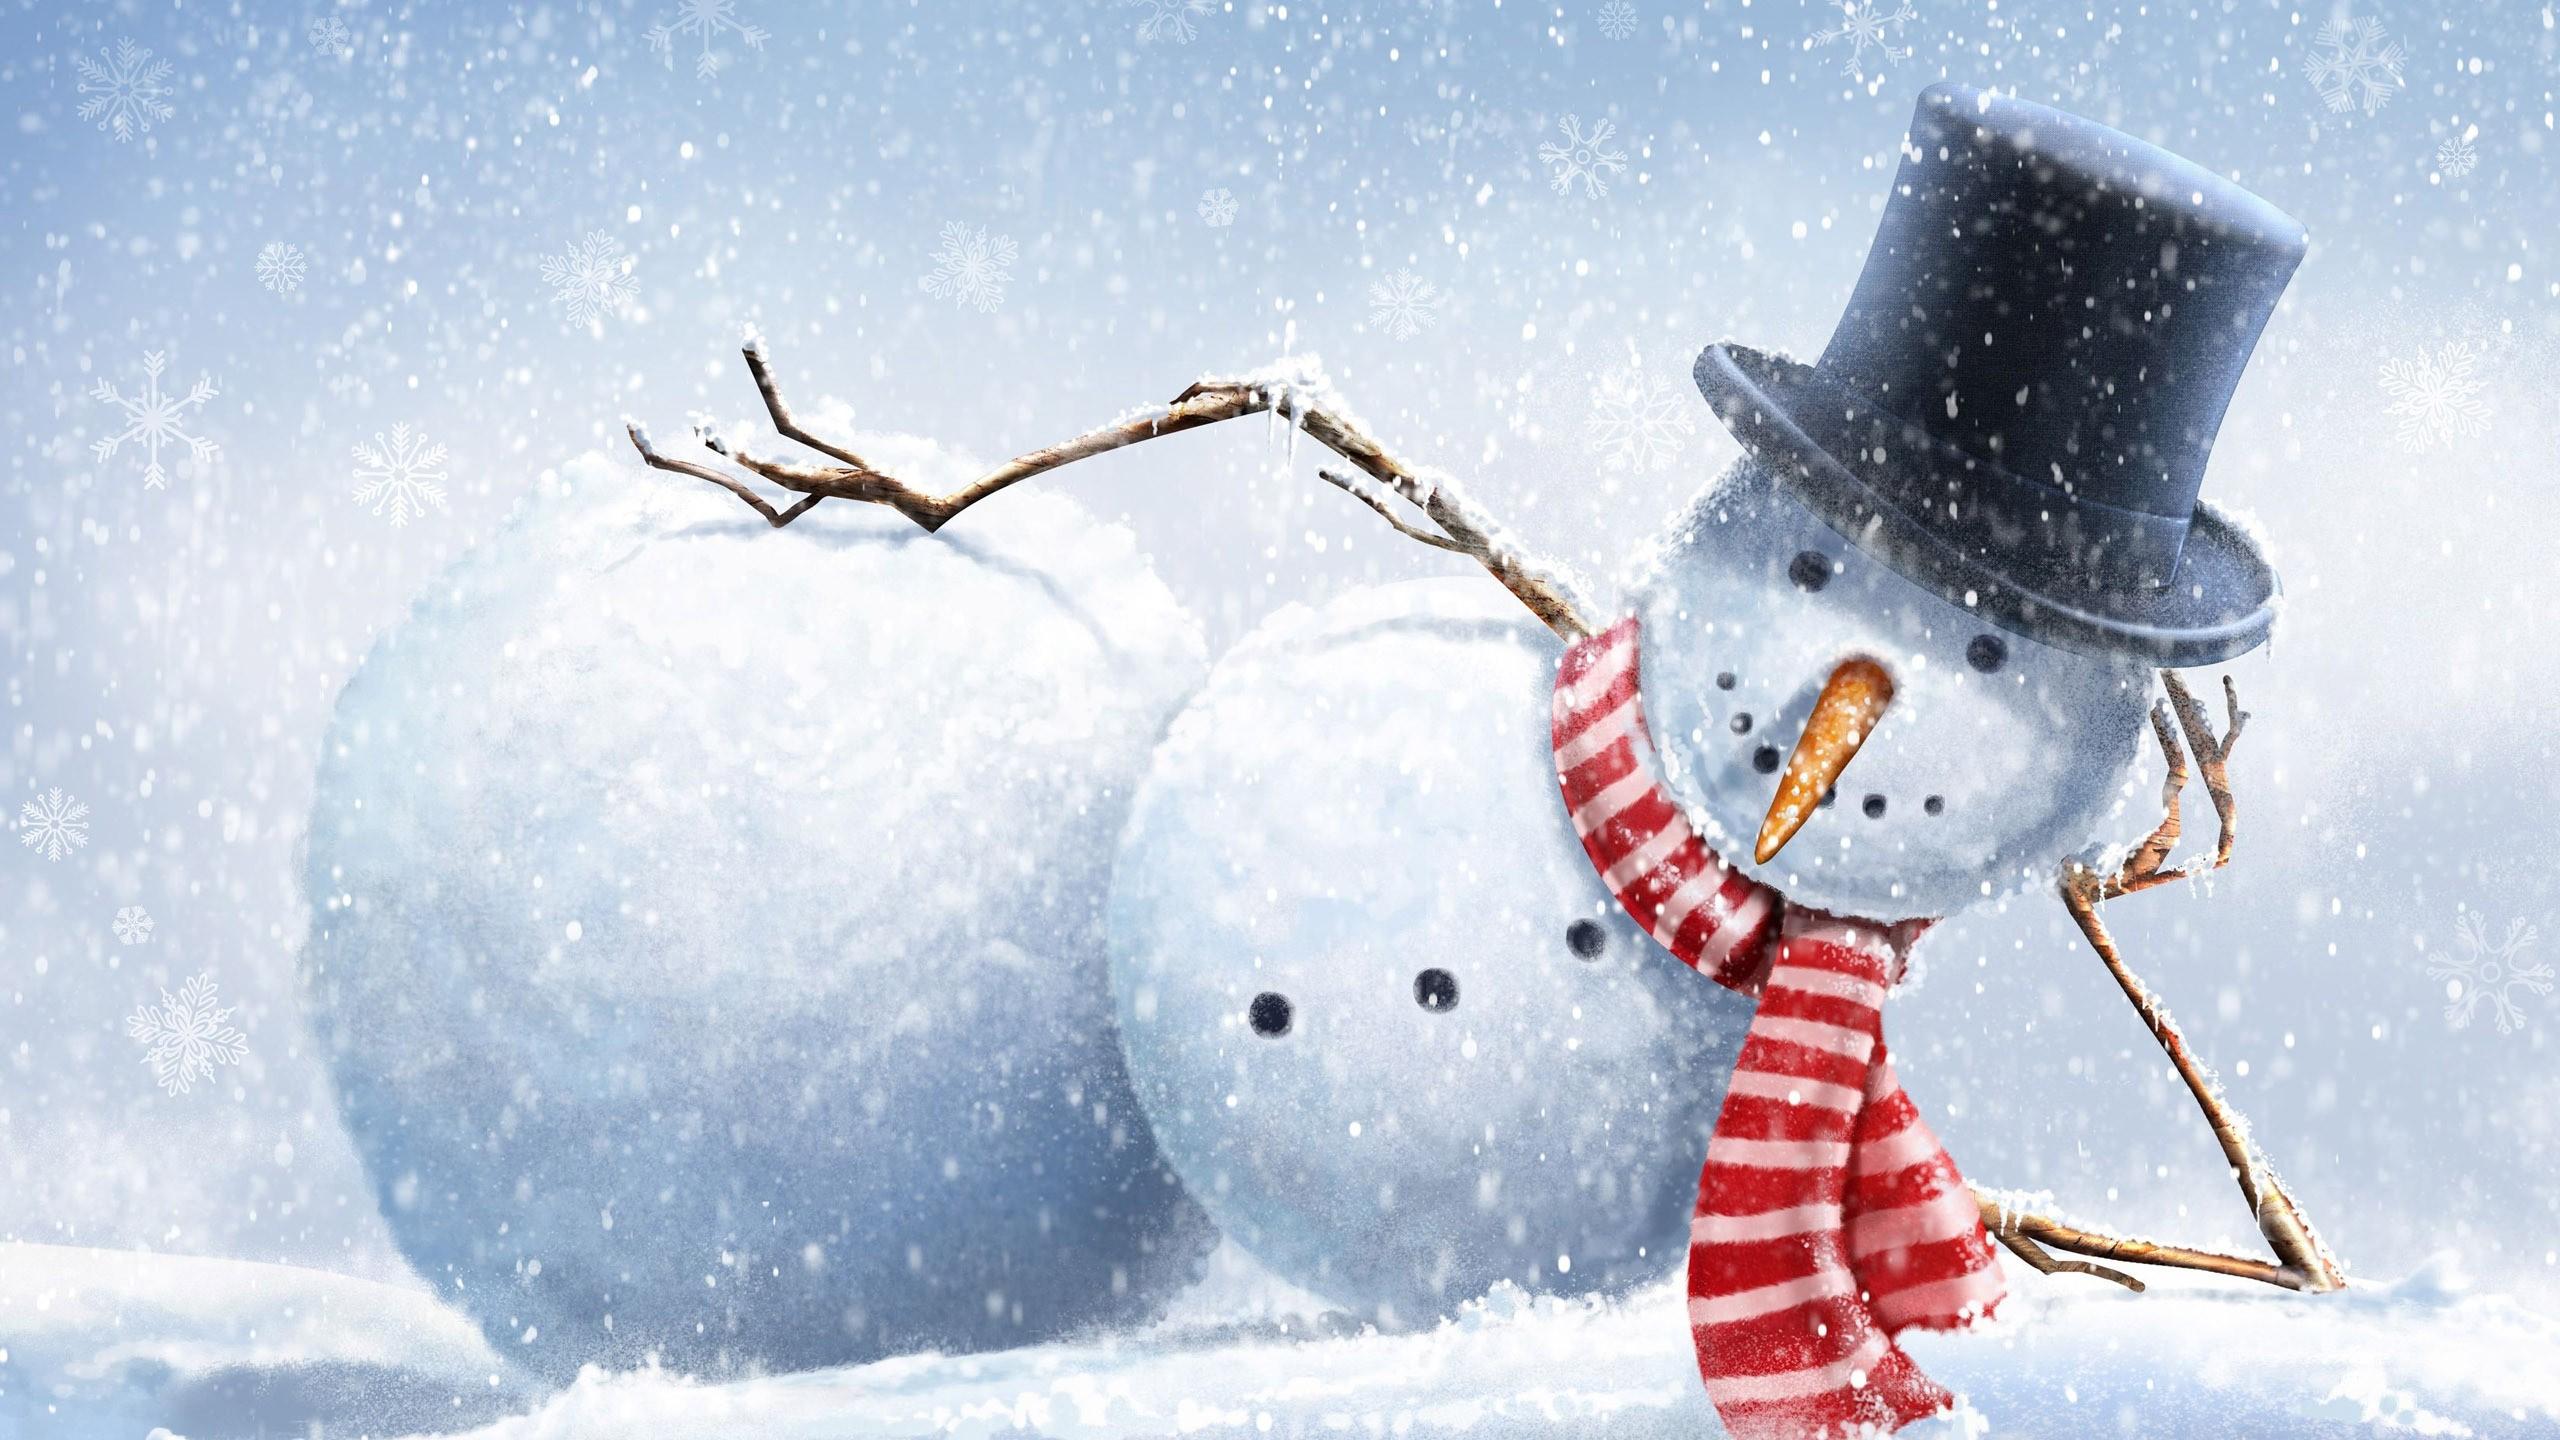 Wallpaper drawing snow winter branch snowman snowflakes top drawing snow winter branch snowman snowflakes top hats freezing carrots weather season 2560x1440 px voltagebd Gallery